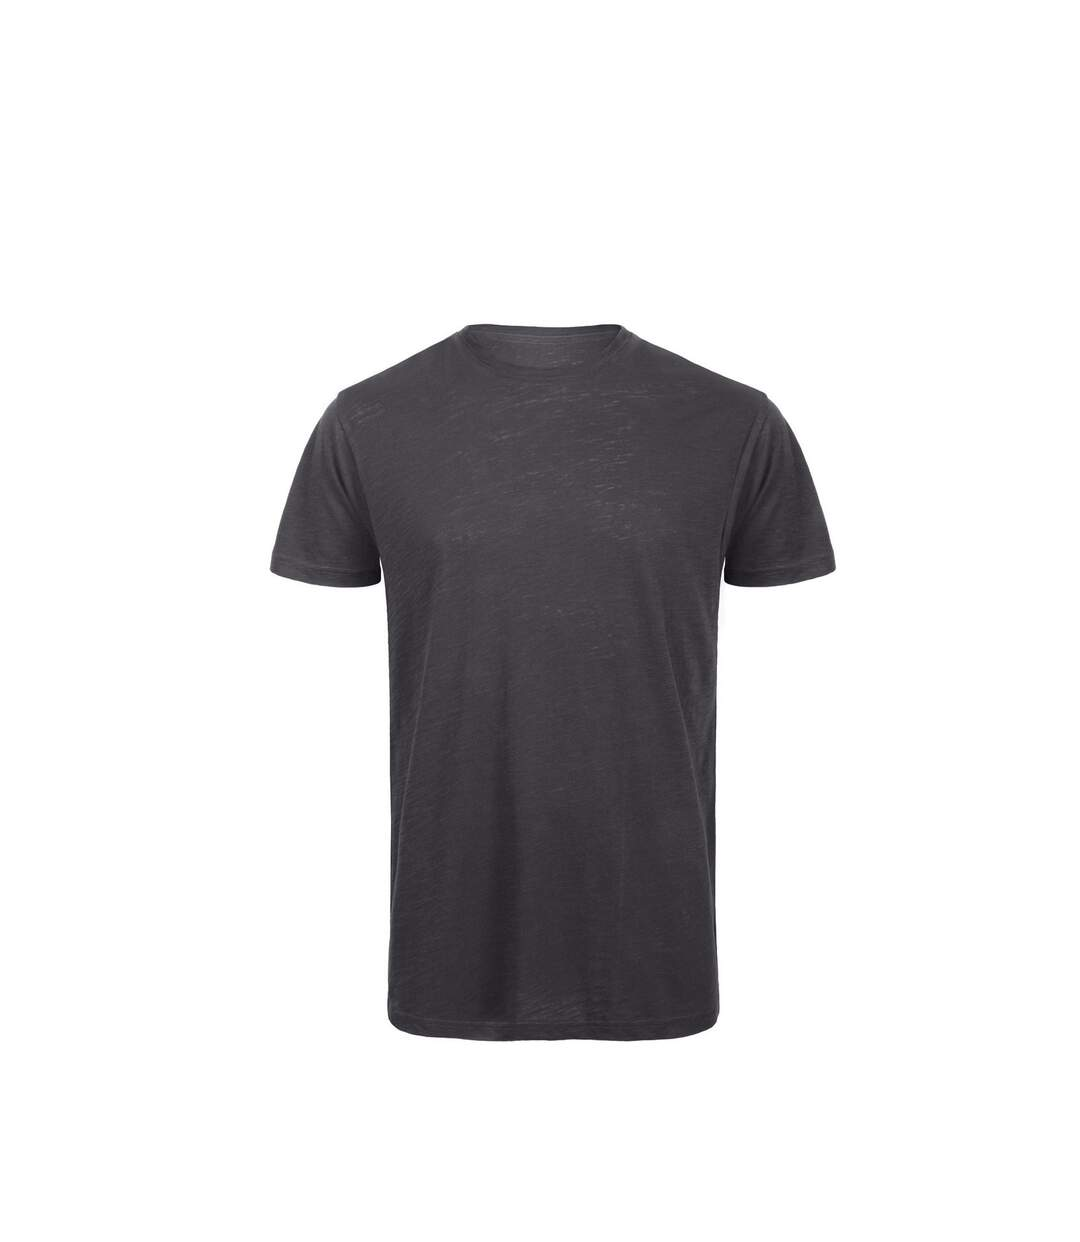 B&C Mens Favourite Organic Cotton Slub T-Shirt (Chic Anthracite) - UTBC3637